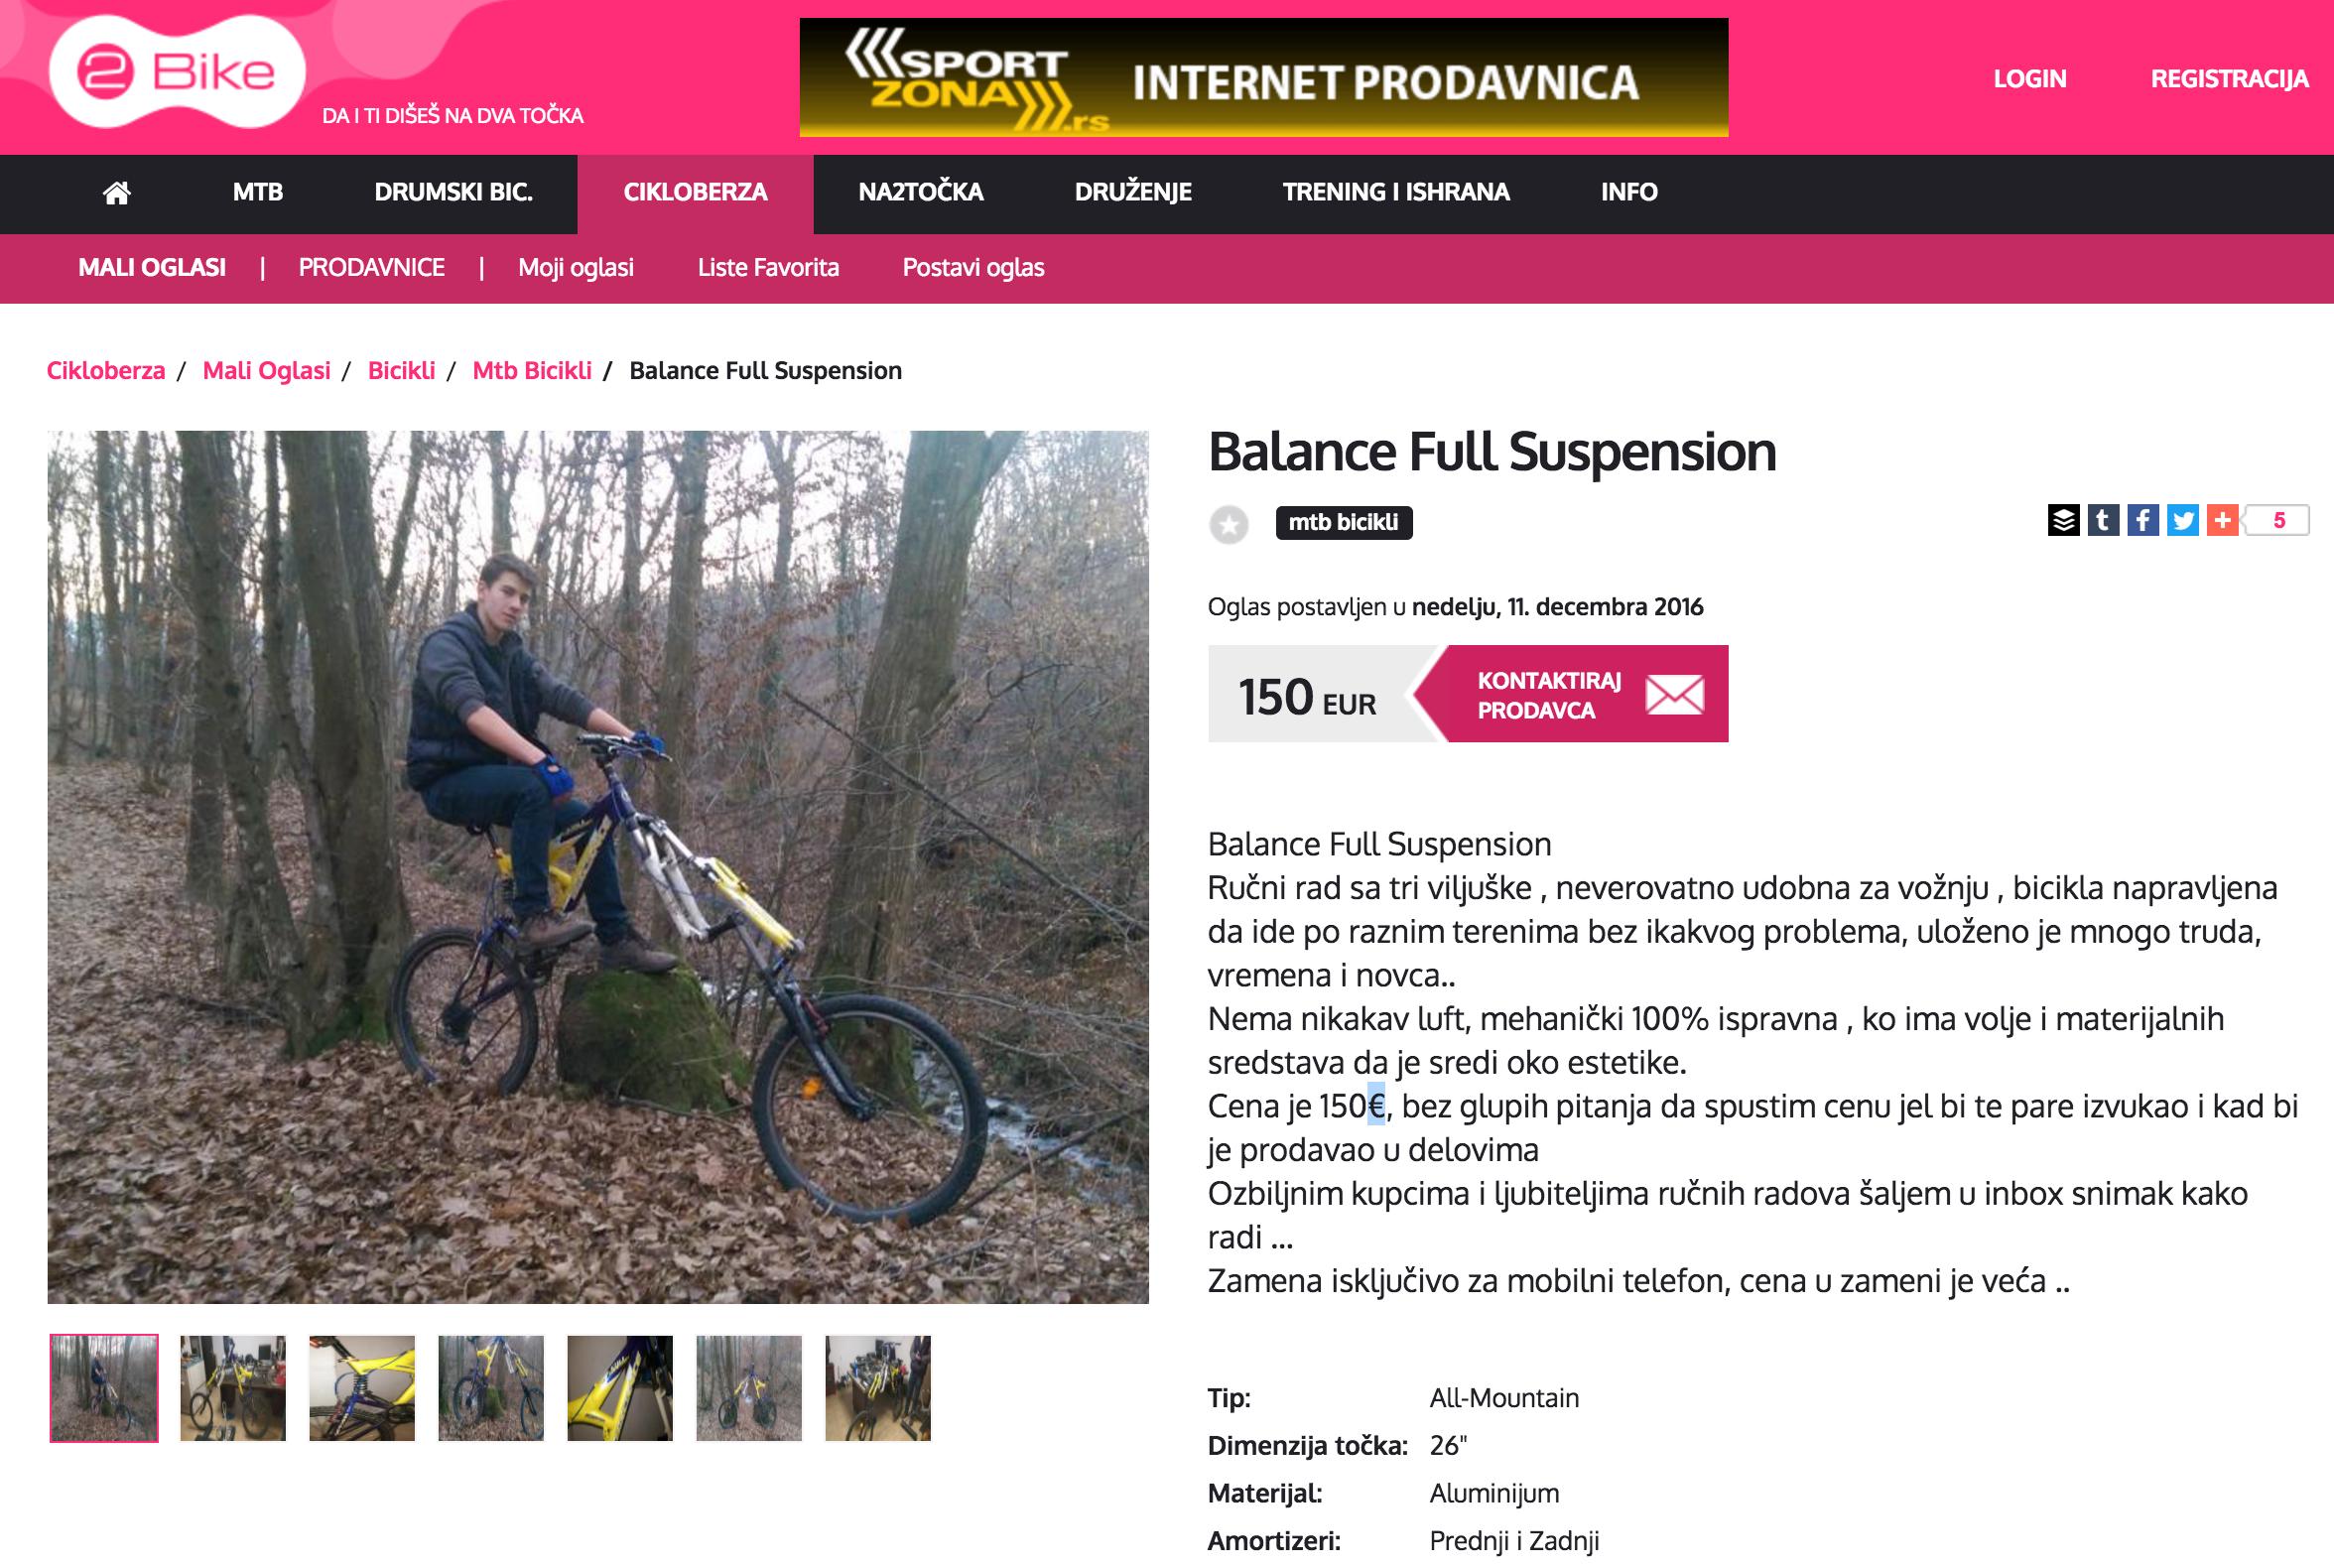 Full suspension Extra Forks advert